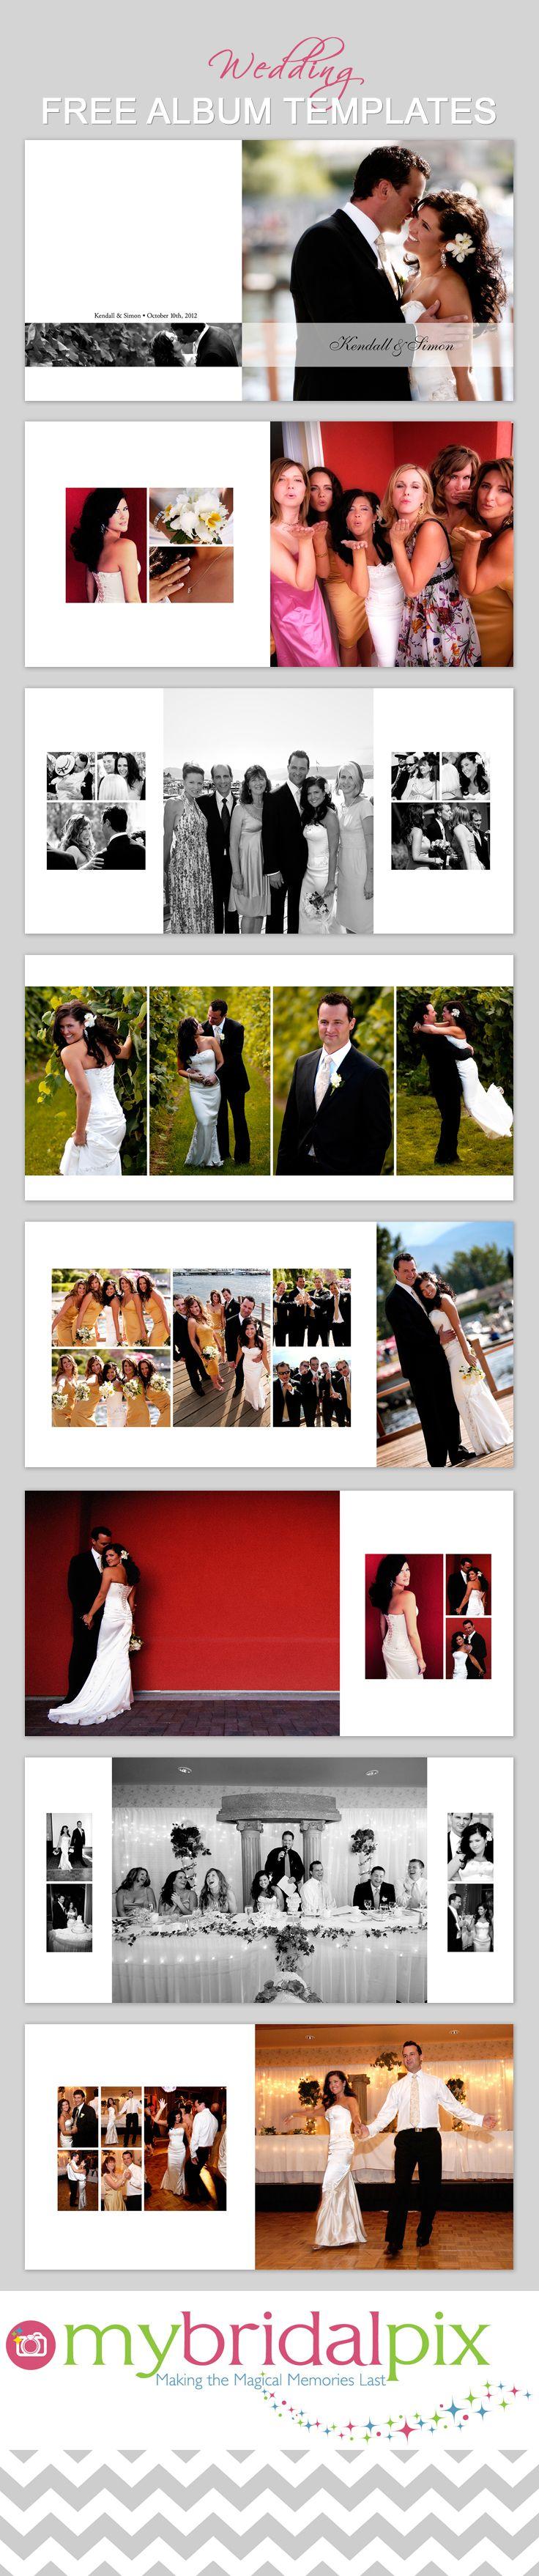 nice layouts; Free wedding album templates at www.mybridalpix.com. /  wedding album photobook template